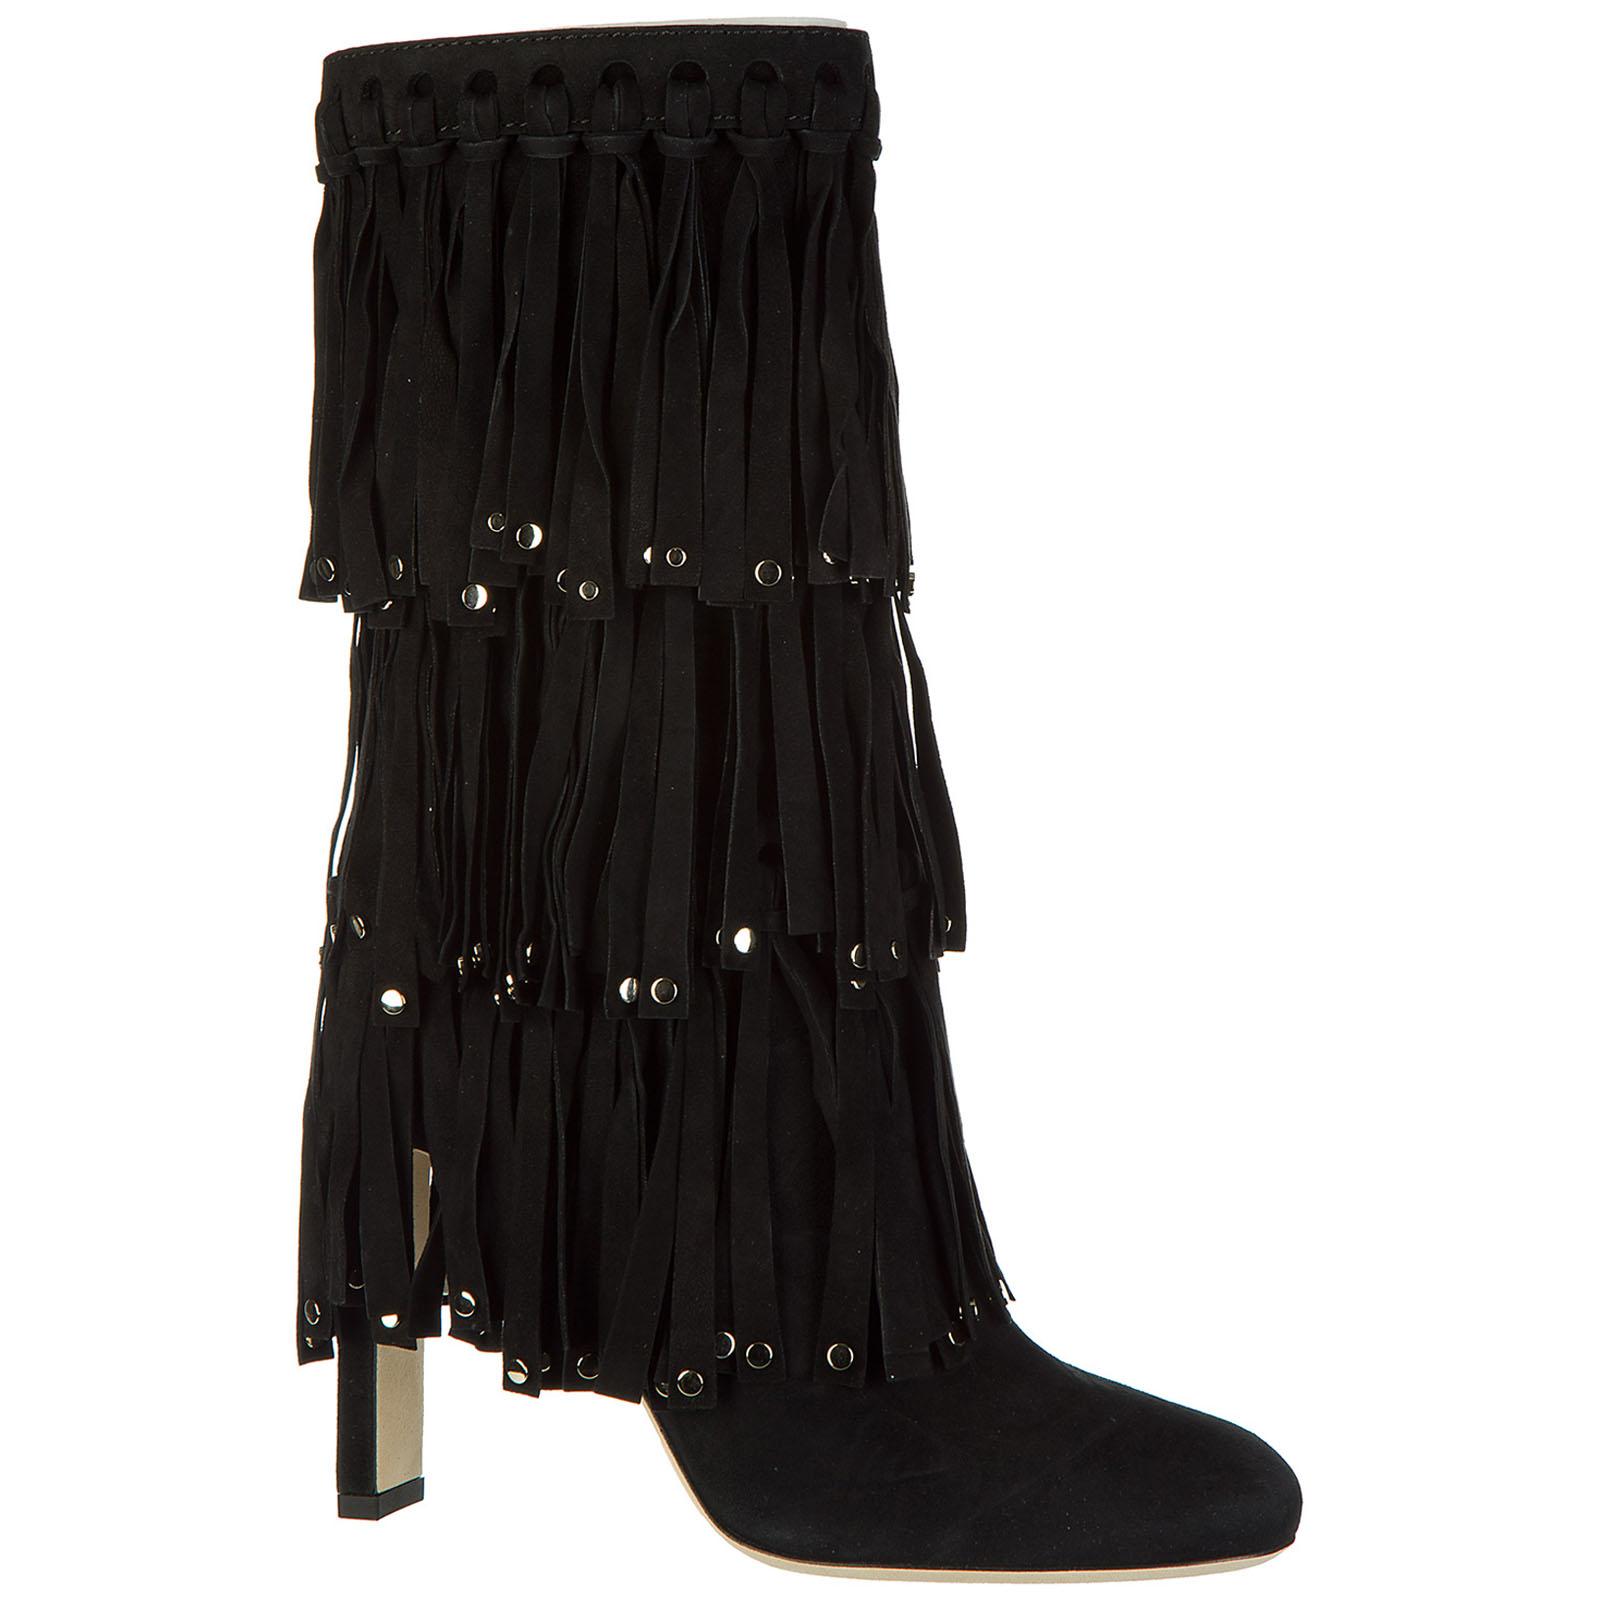 Women's suede heel'ankle boots booties mystery 100